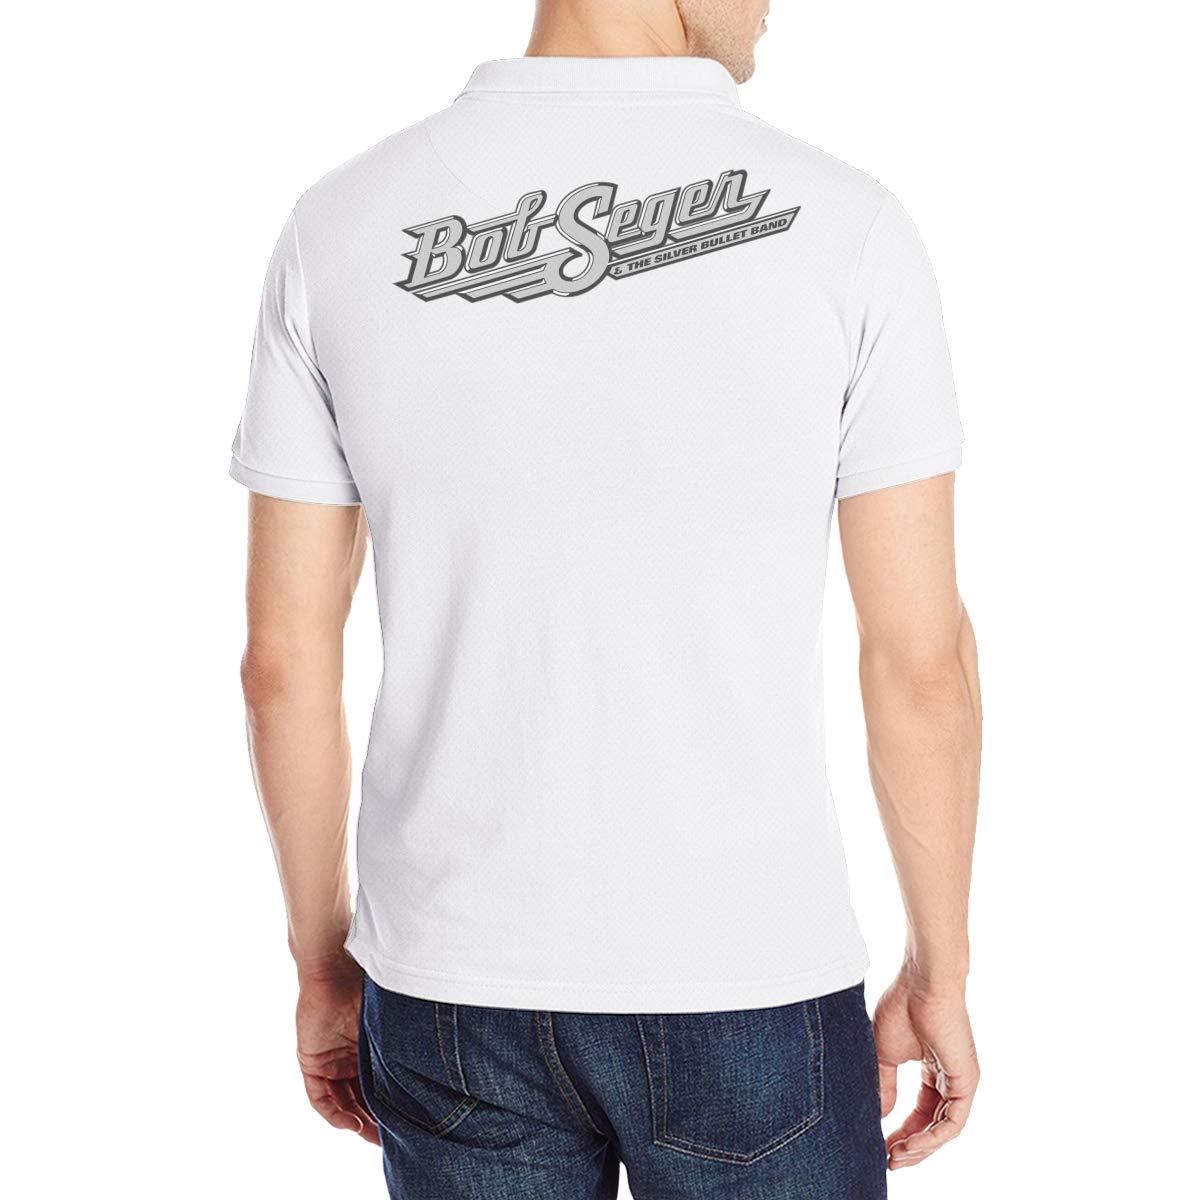 Men Polo Shirt Short Sleeve Lapel Blouse Black Arilce Bob-Seger-The-Silver-Bullet-Band